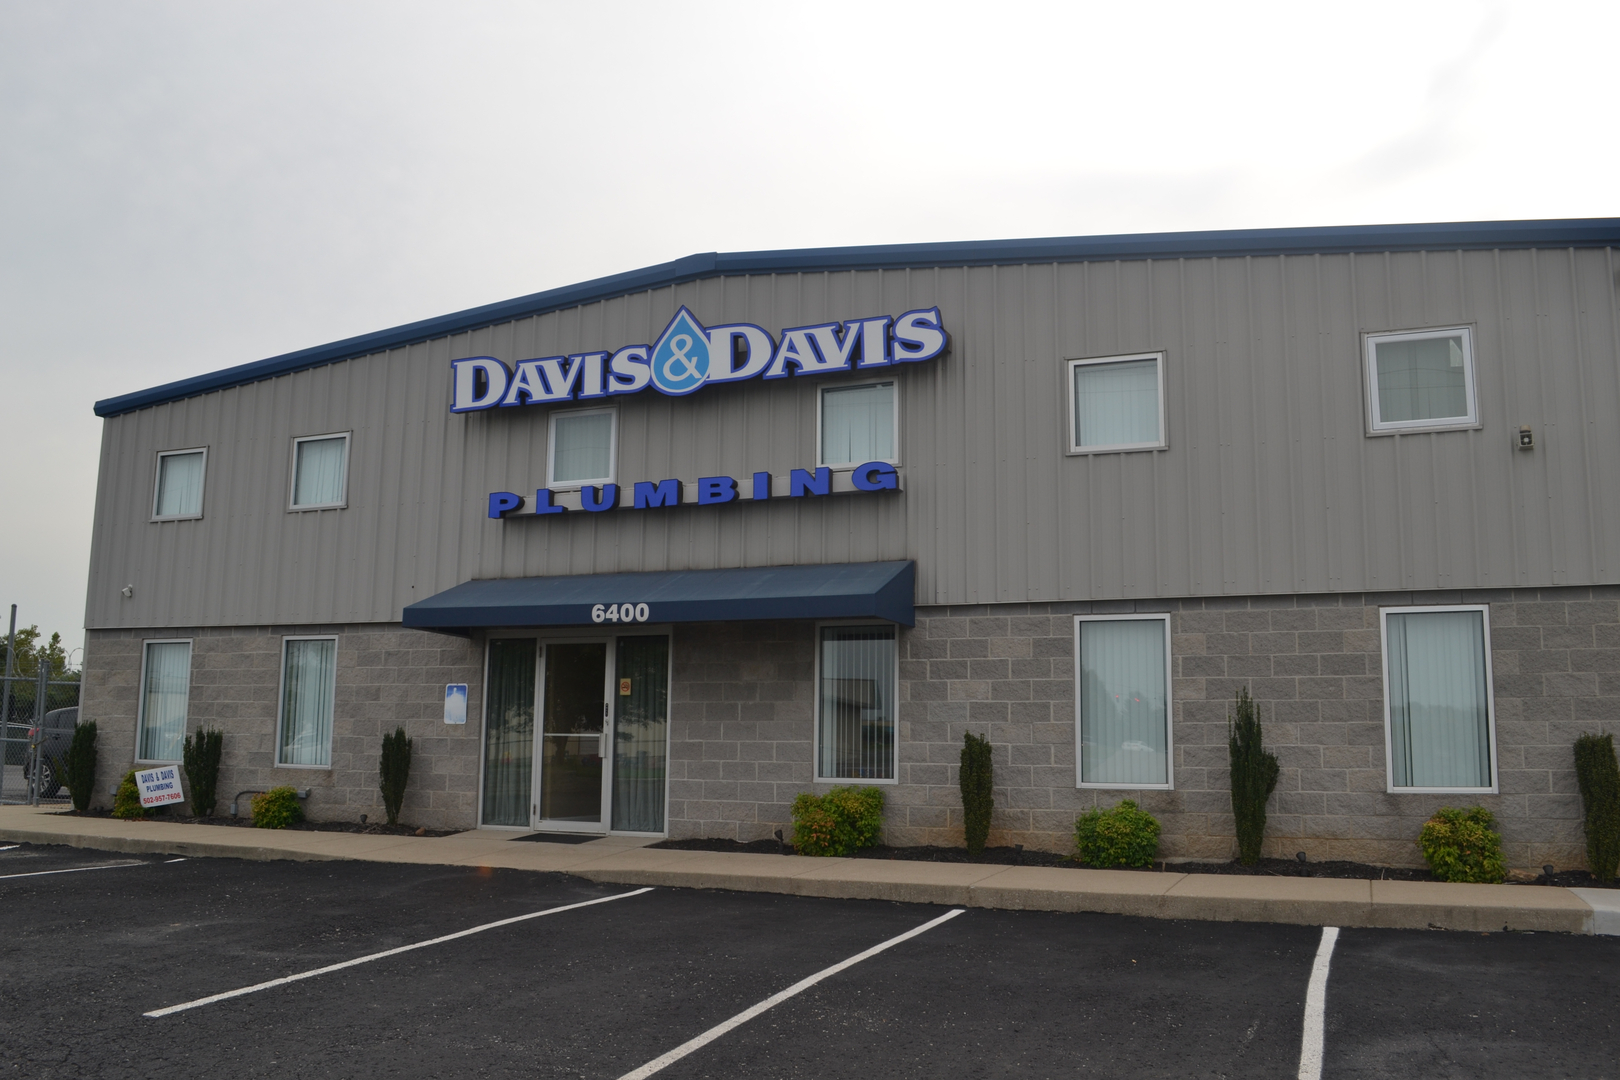 Davis Amp Davis Plumbing Inc 6400 N Preston Hwy Louisville